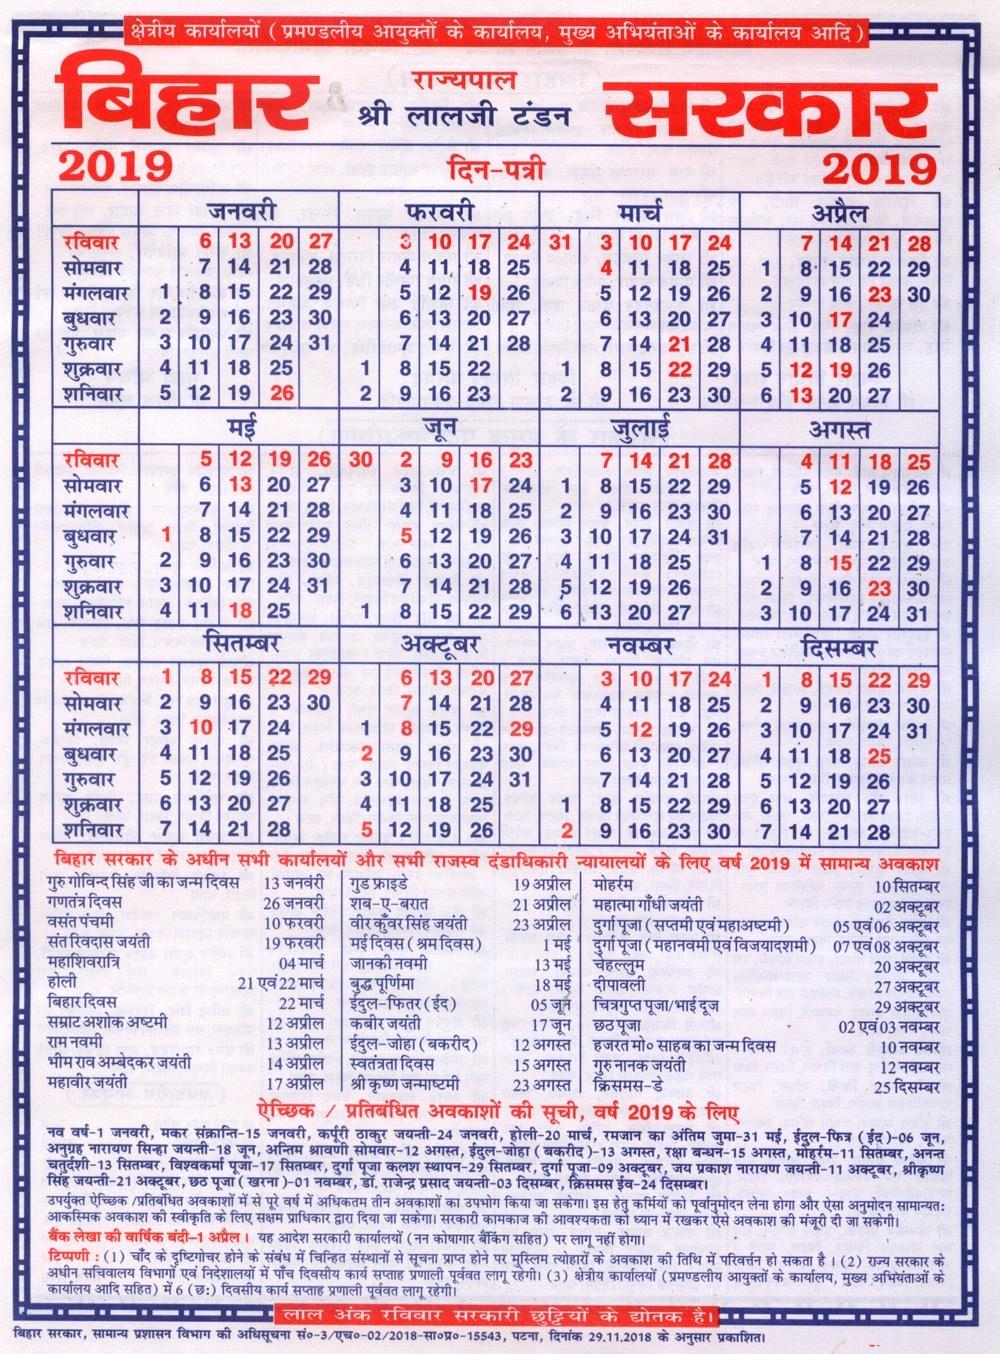 Bihar_Government_Calendar2019 | Bihar School pertaining to Bihar Government Calender 2020